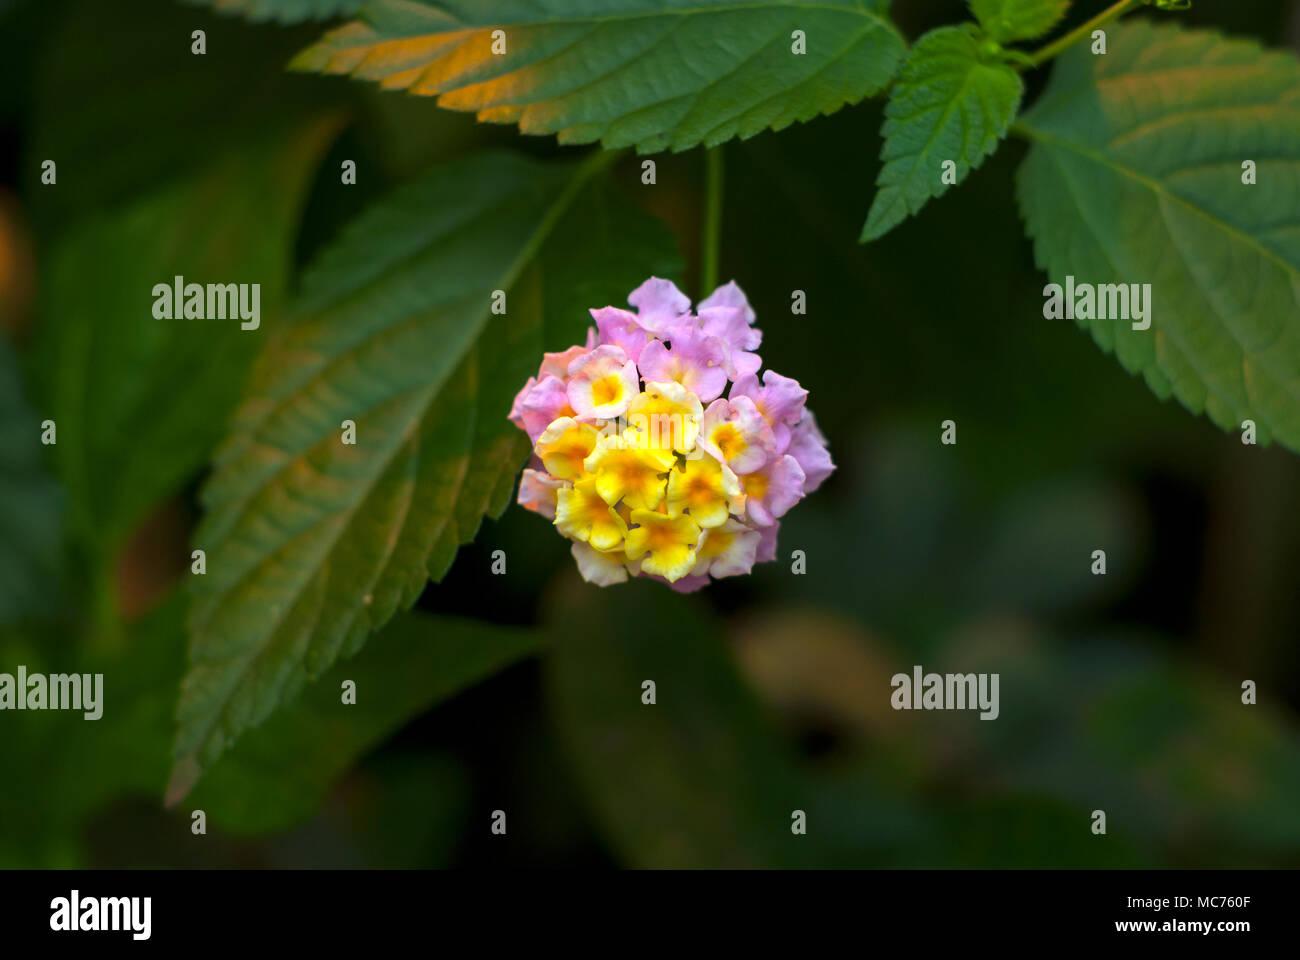 beautiful yellow-pink inflorescence of a tropical flower Lantana camara (big-sage,  wild-sage, red-sage, white-sage or tickberry) Stock Photo